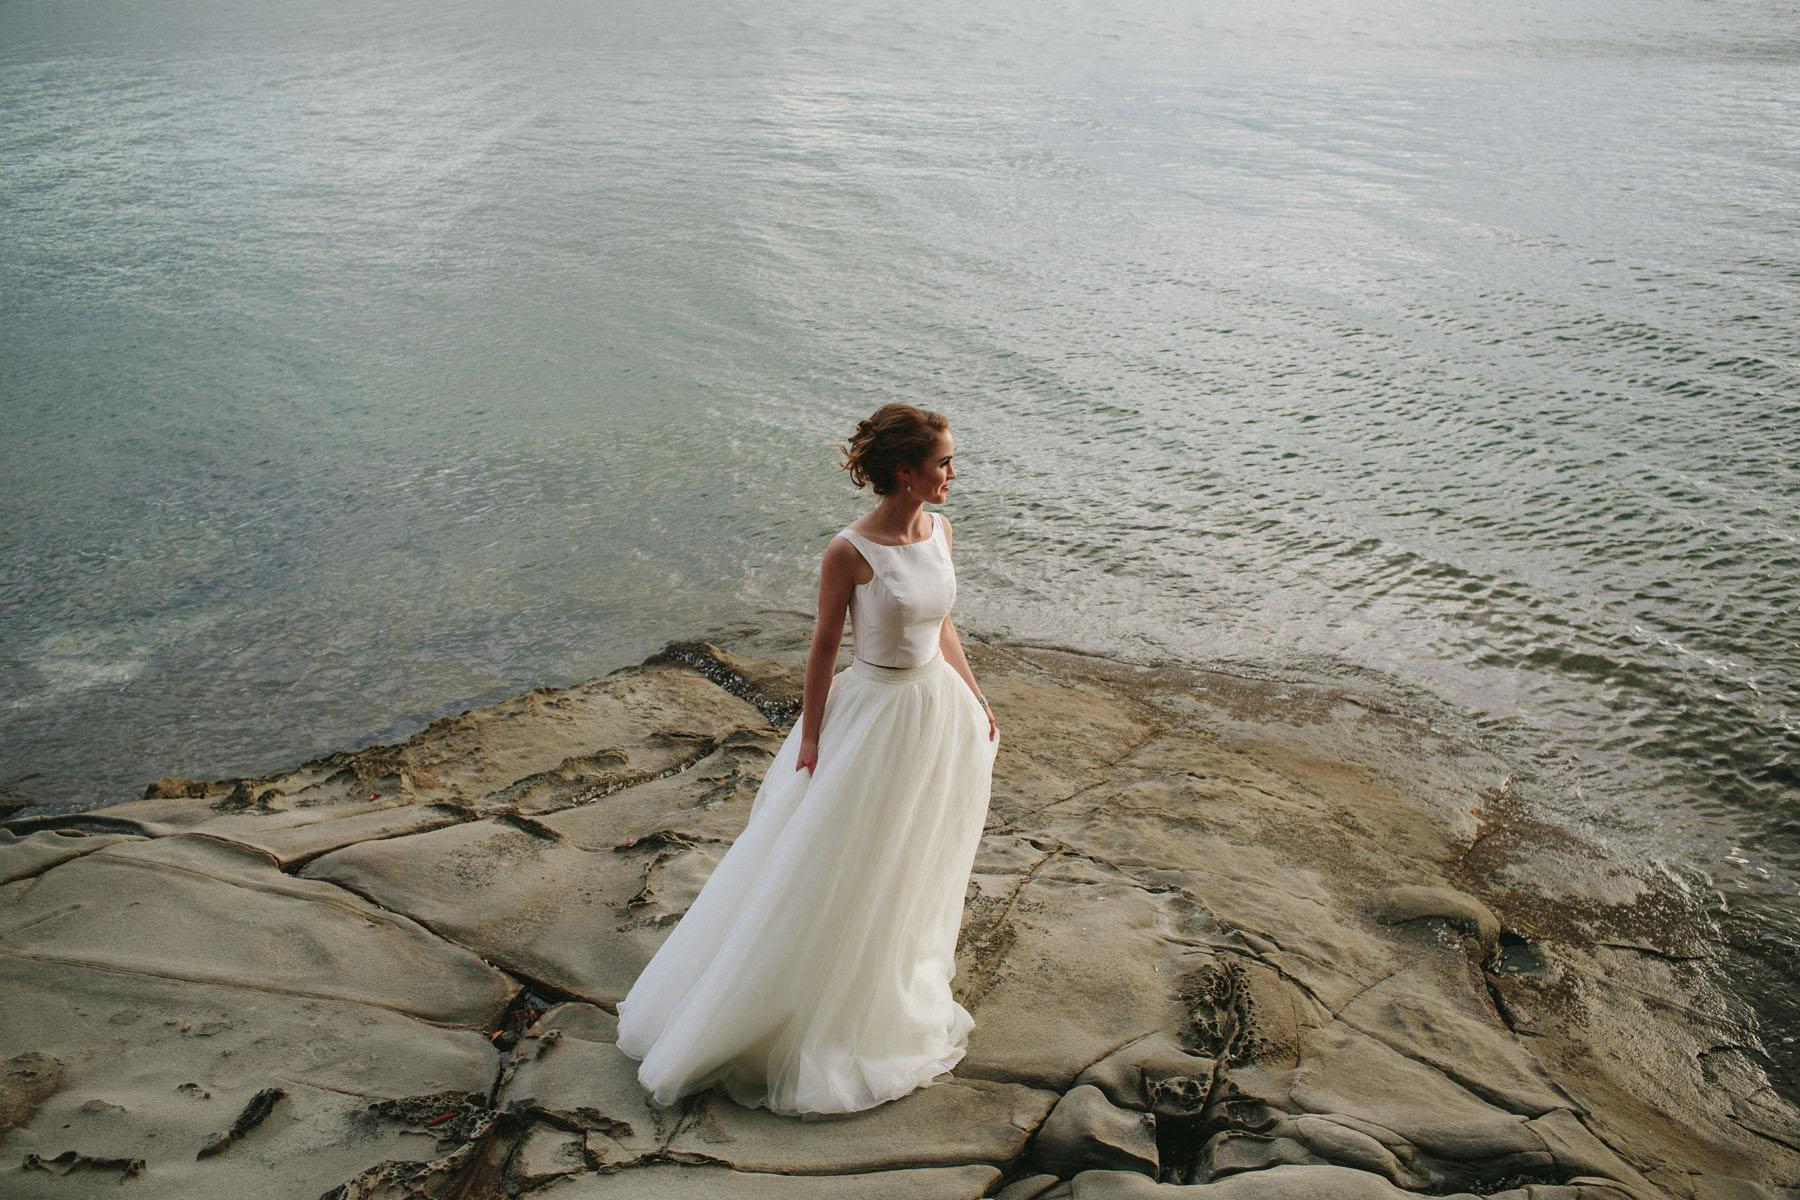 thetis-island-wedding-photographer-rp-rn-144.jpg